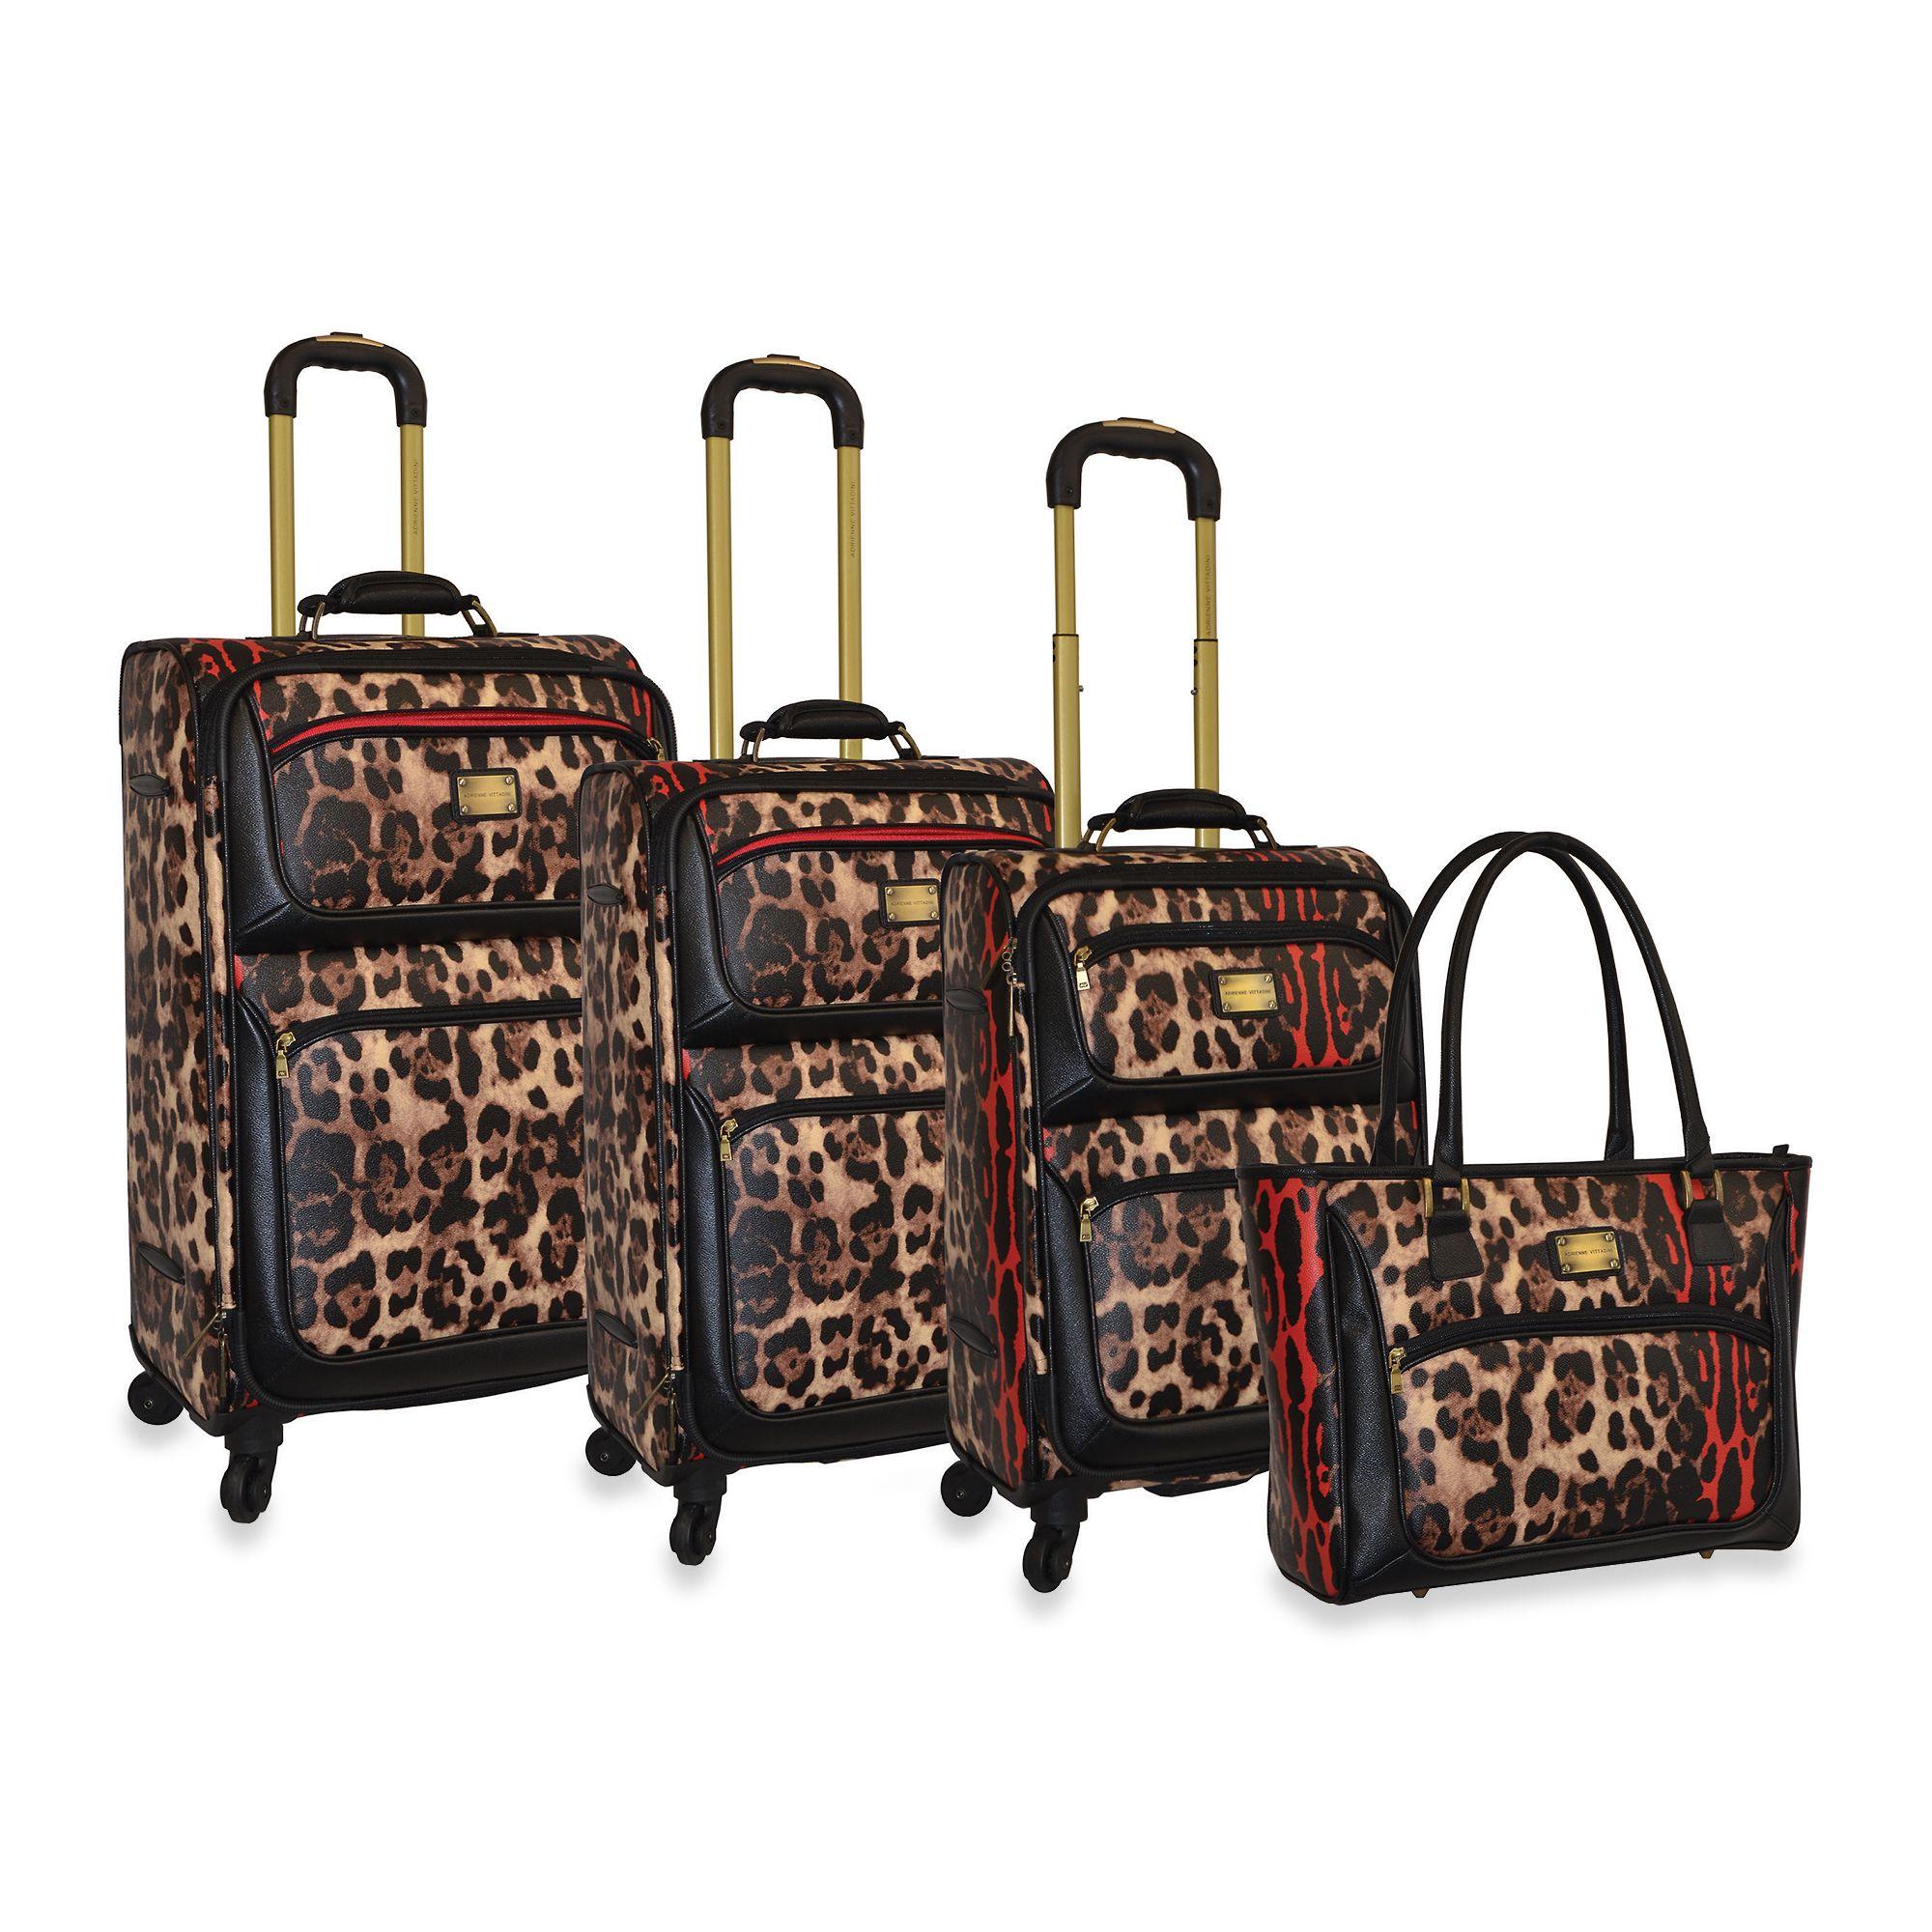 Hawaiian Luggage Sets Spinner Luggage Set